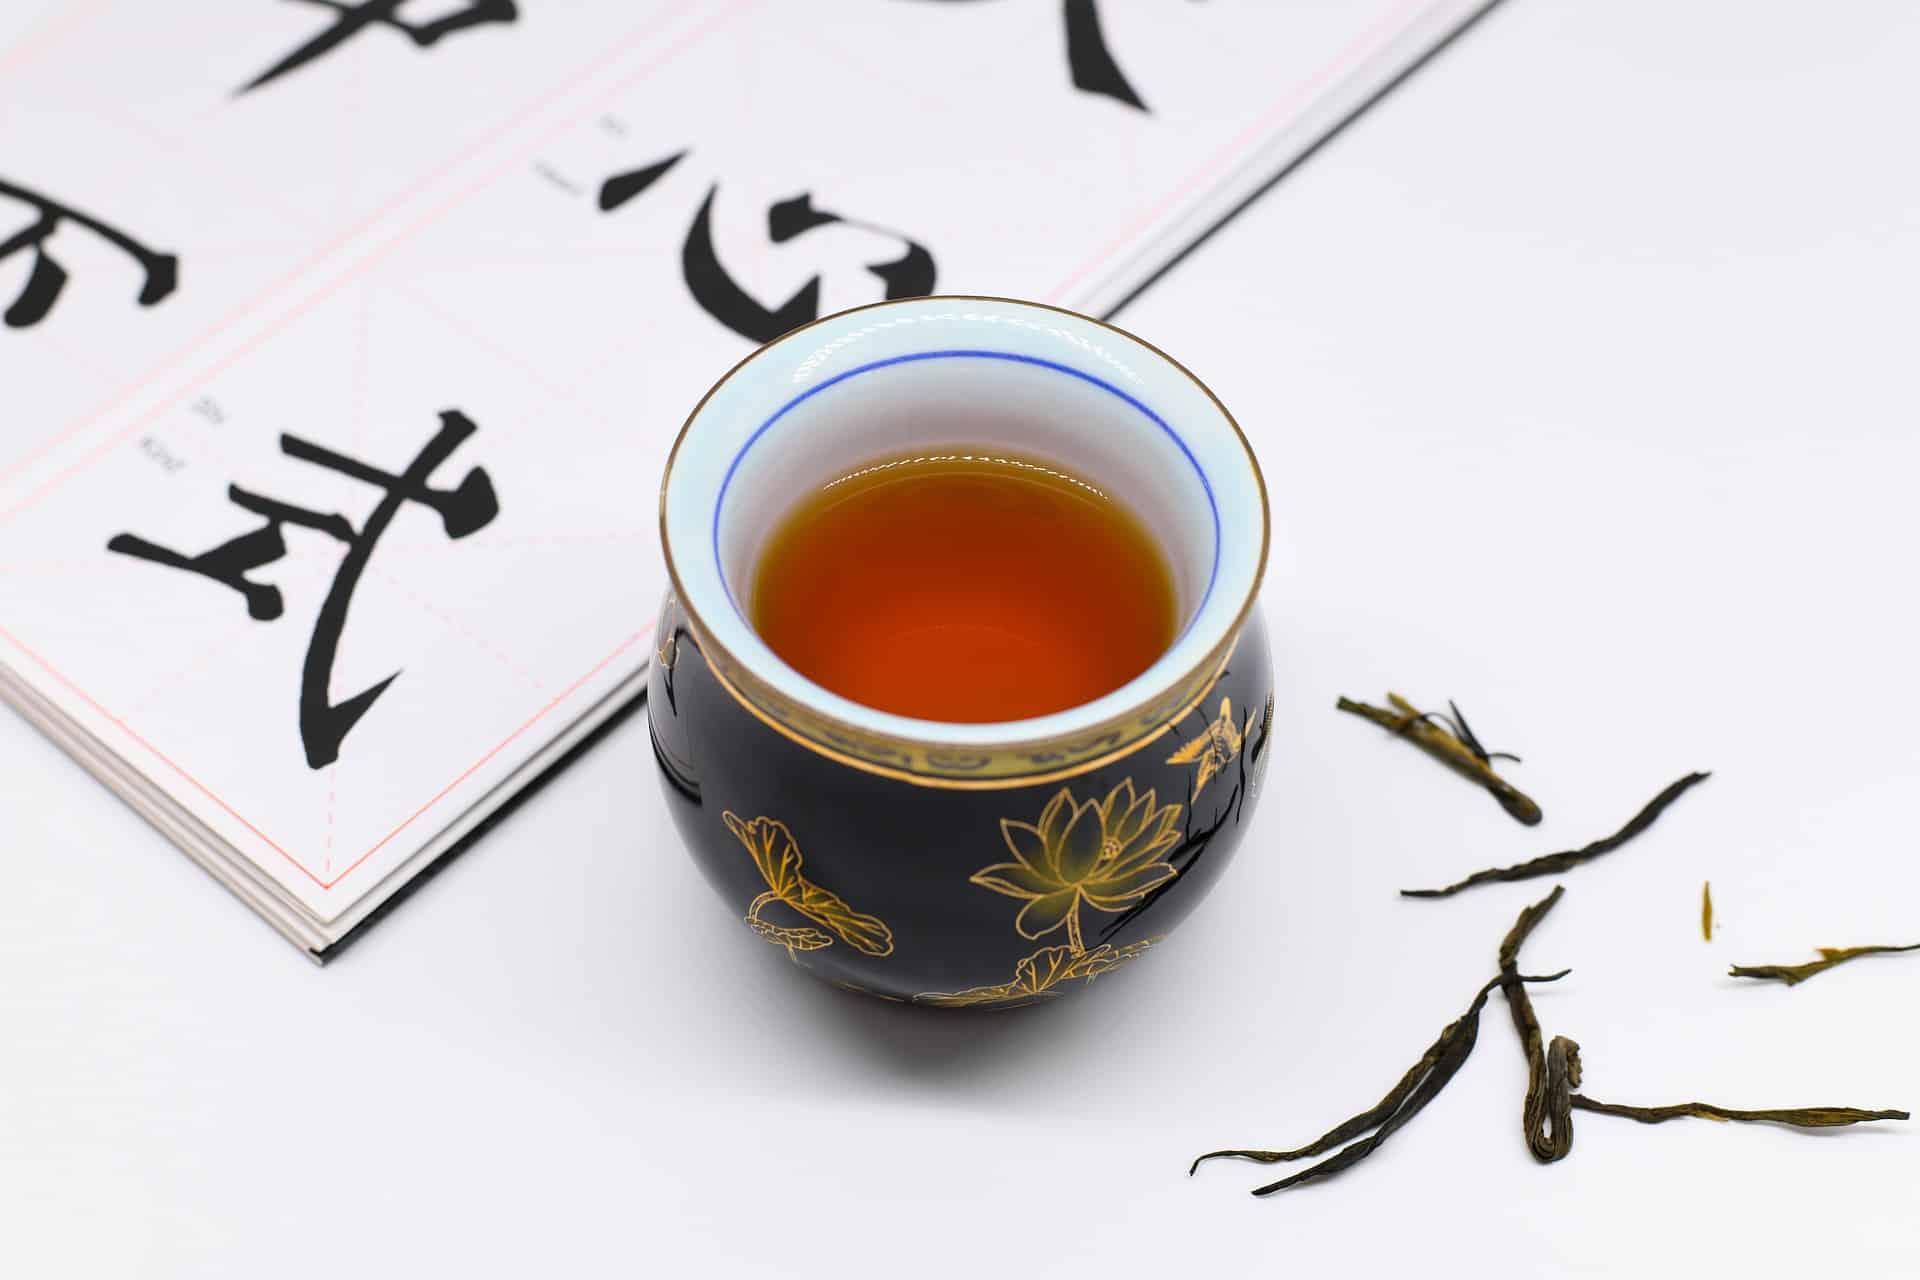 kung-fu-tea-history-8796465